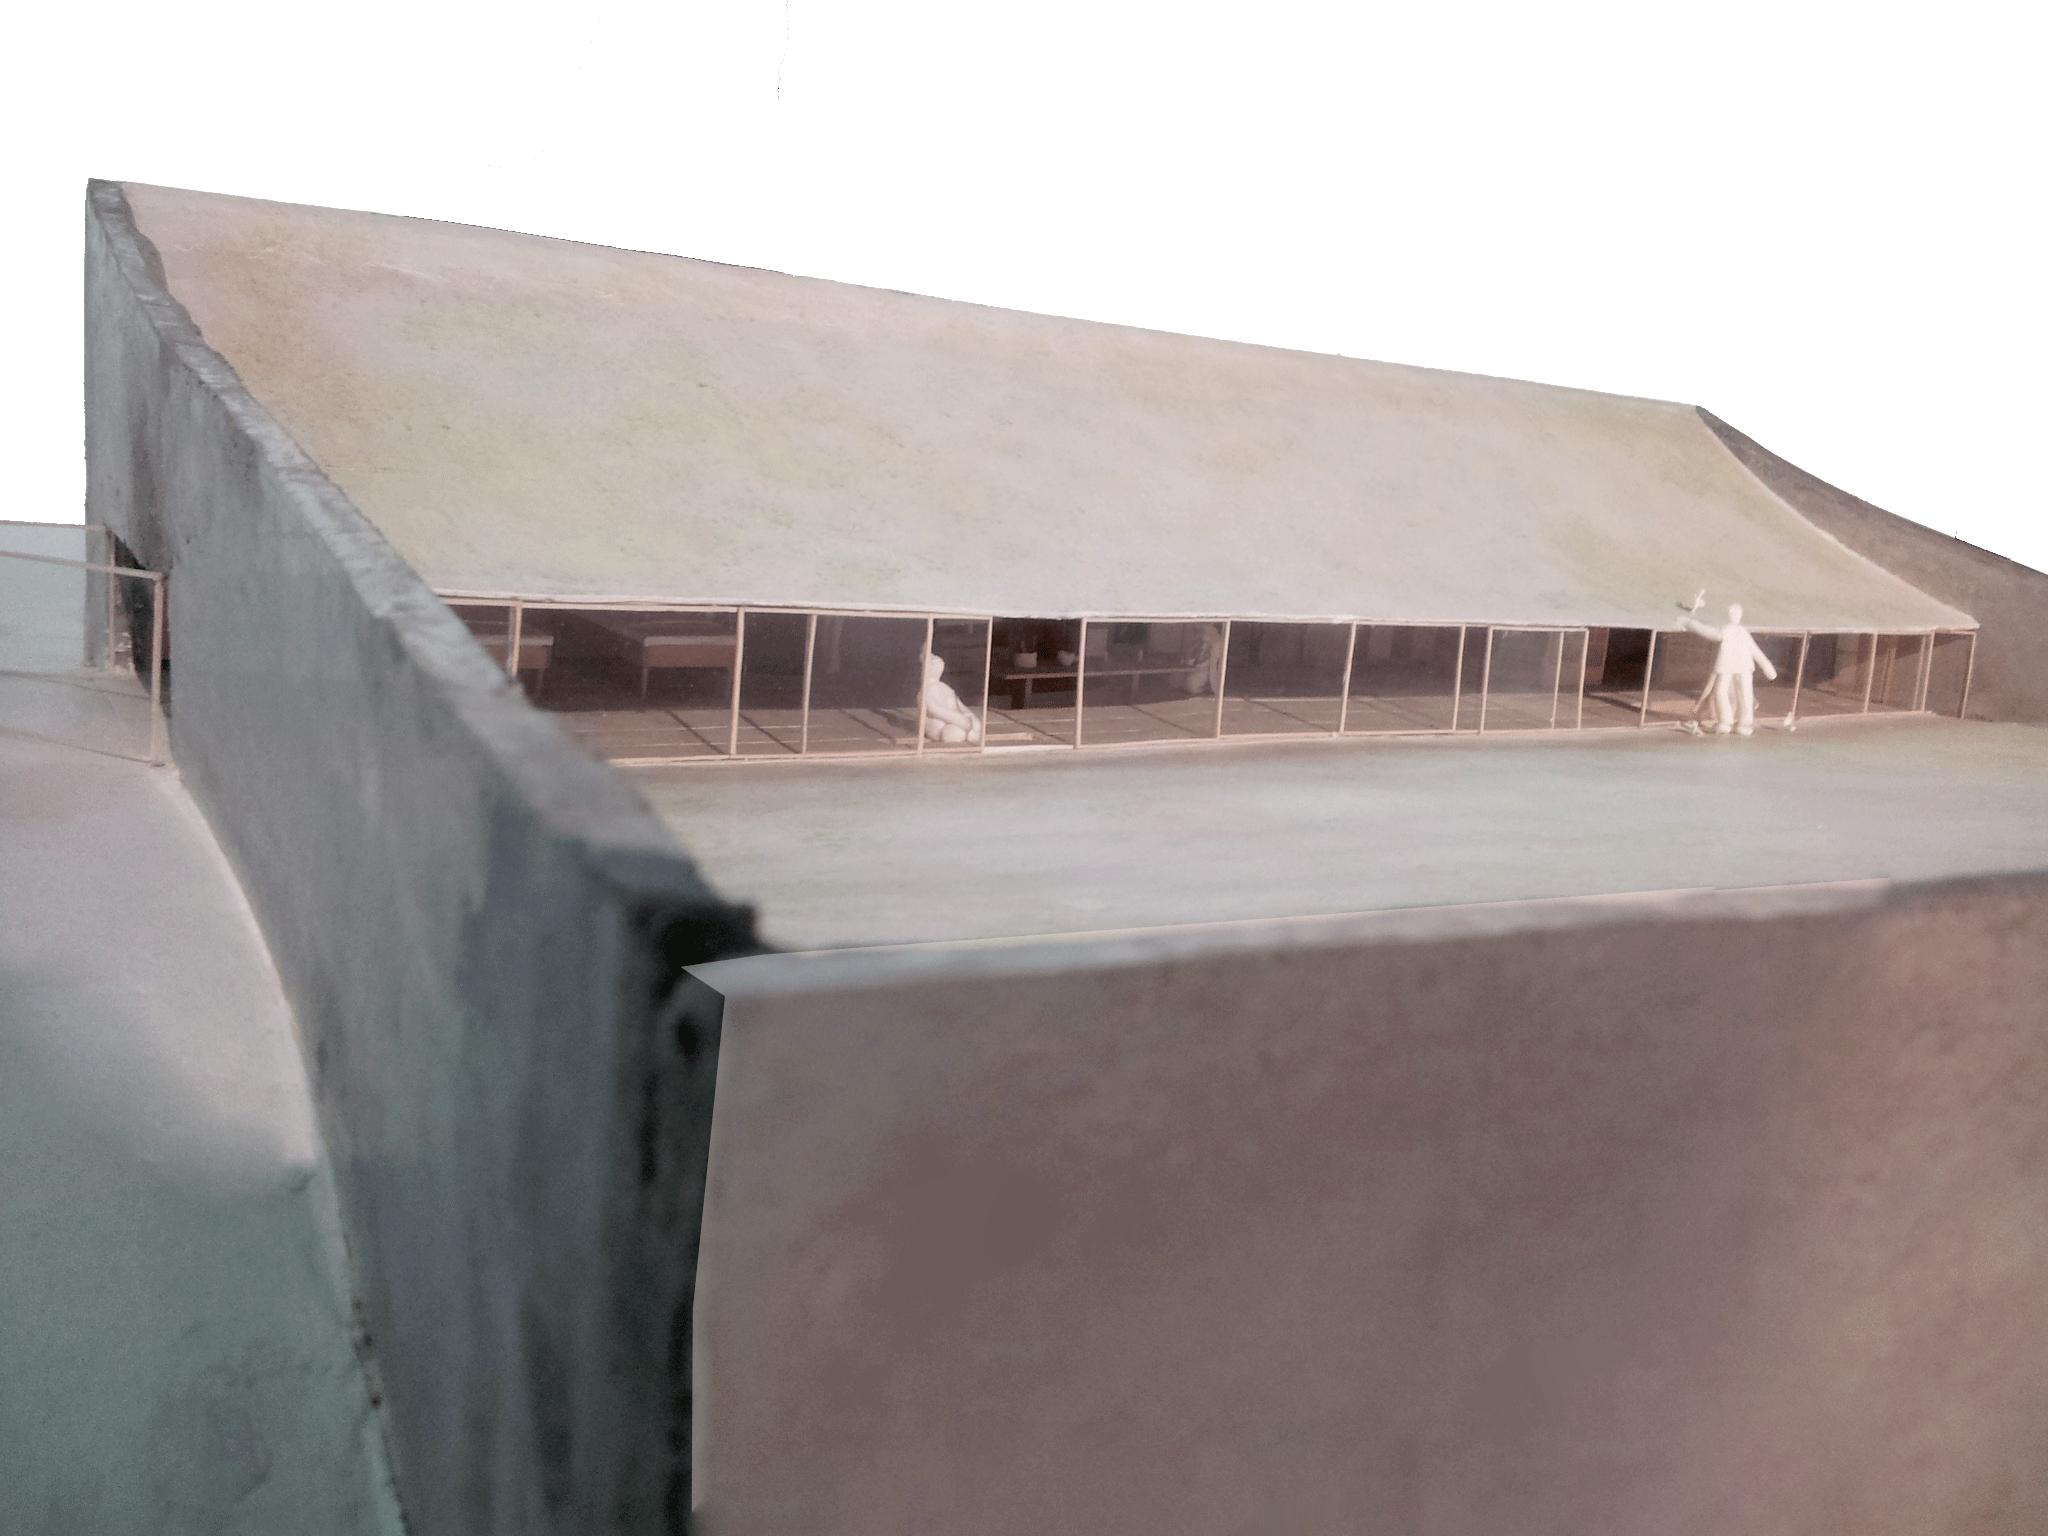 Junya-Ishigami-Freeing-Architecture-11